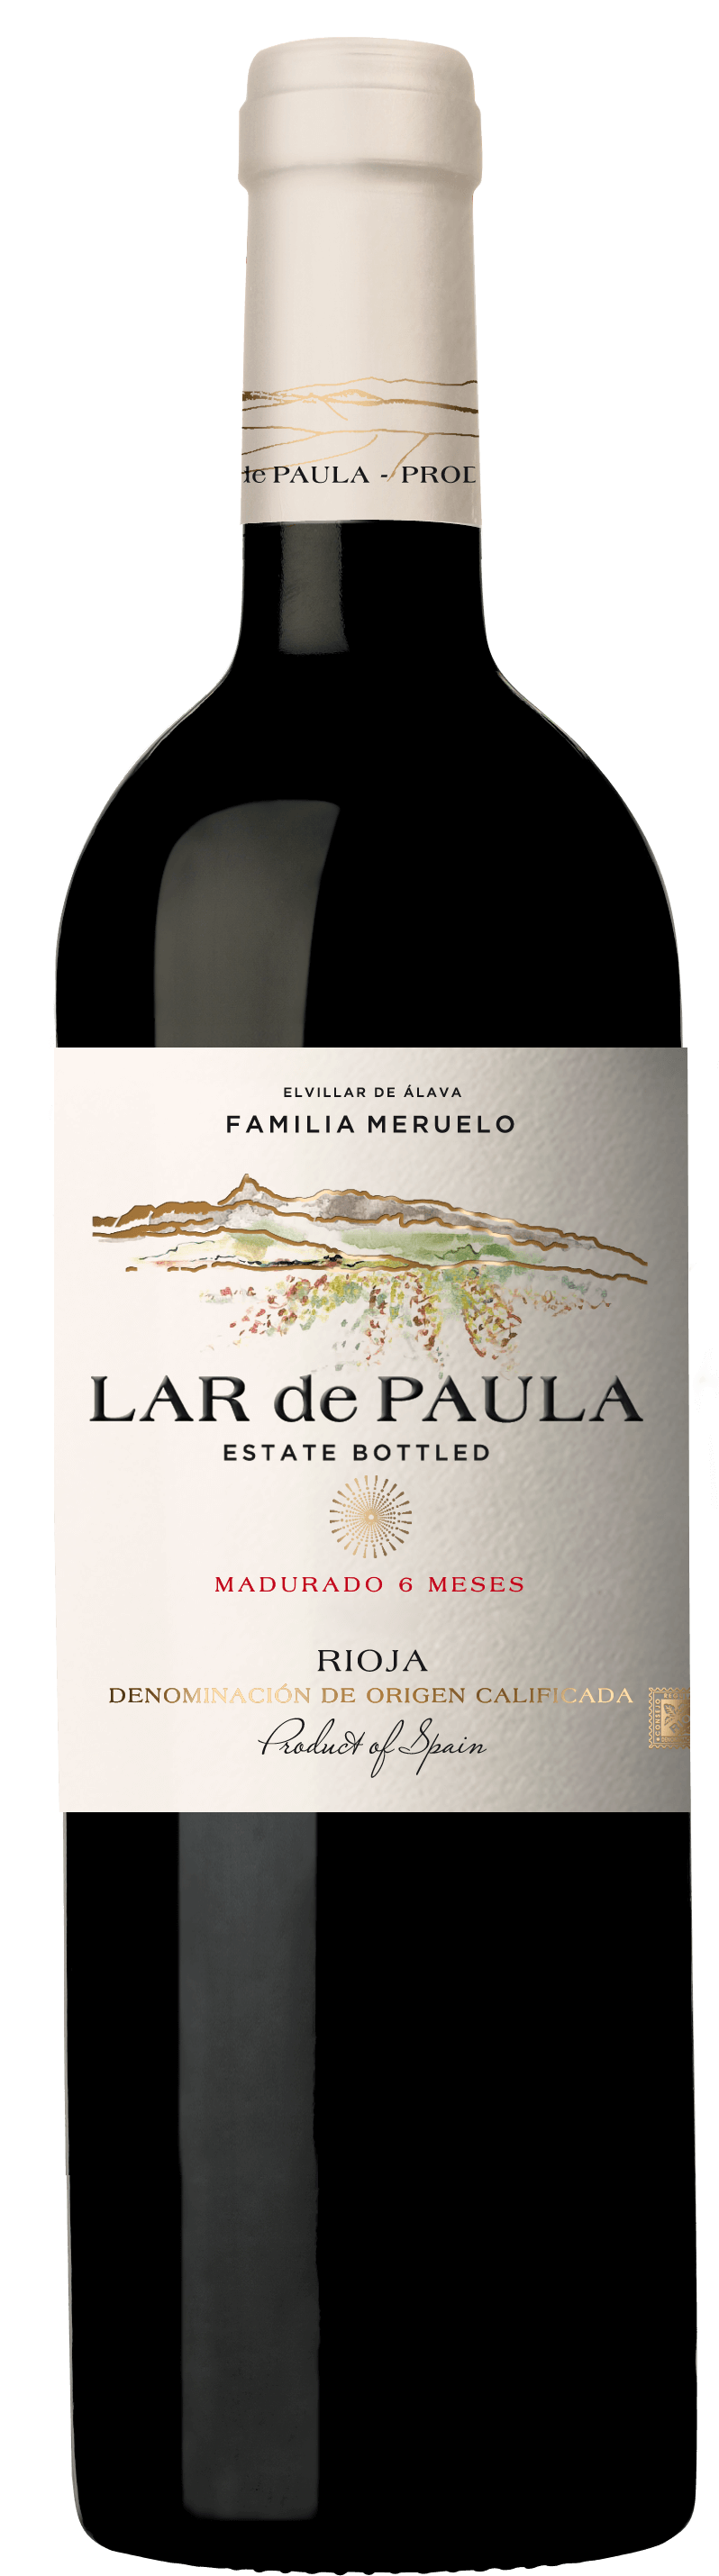 Lar de Paula Oak Aged DOCa Rioja (Alavesa)